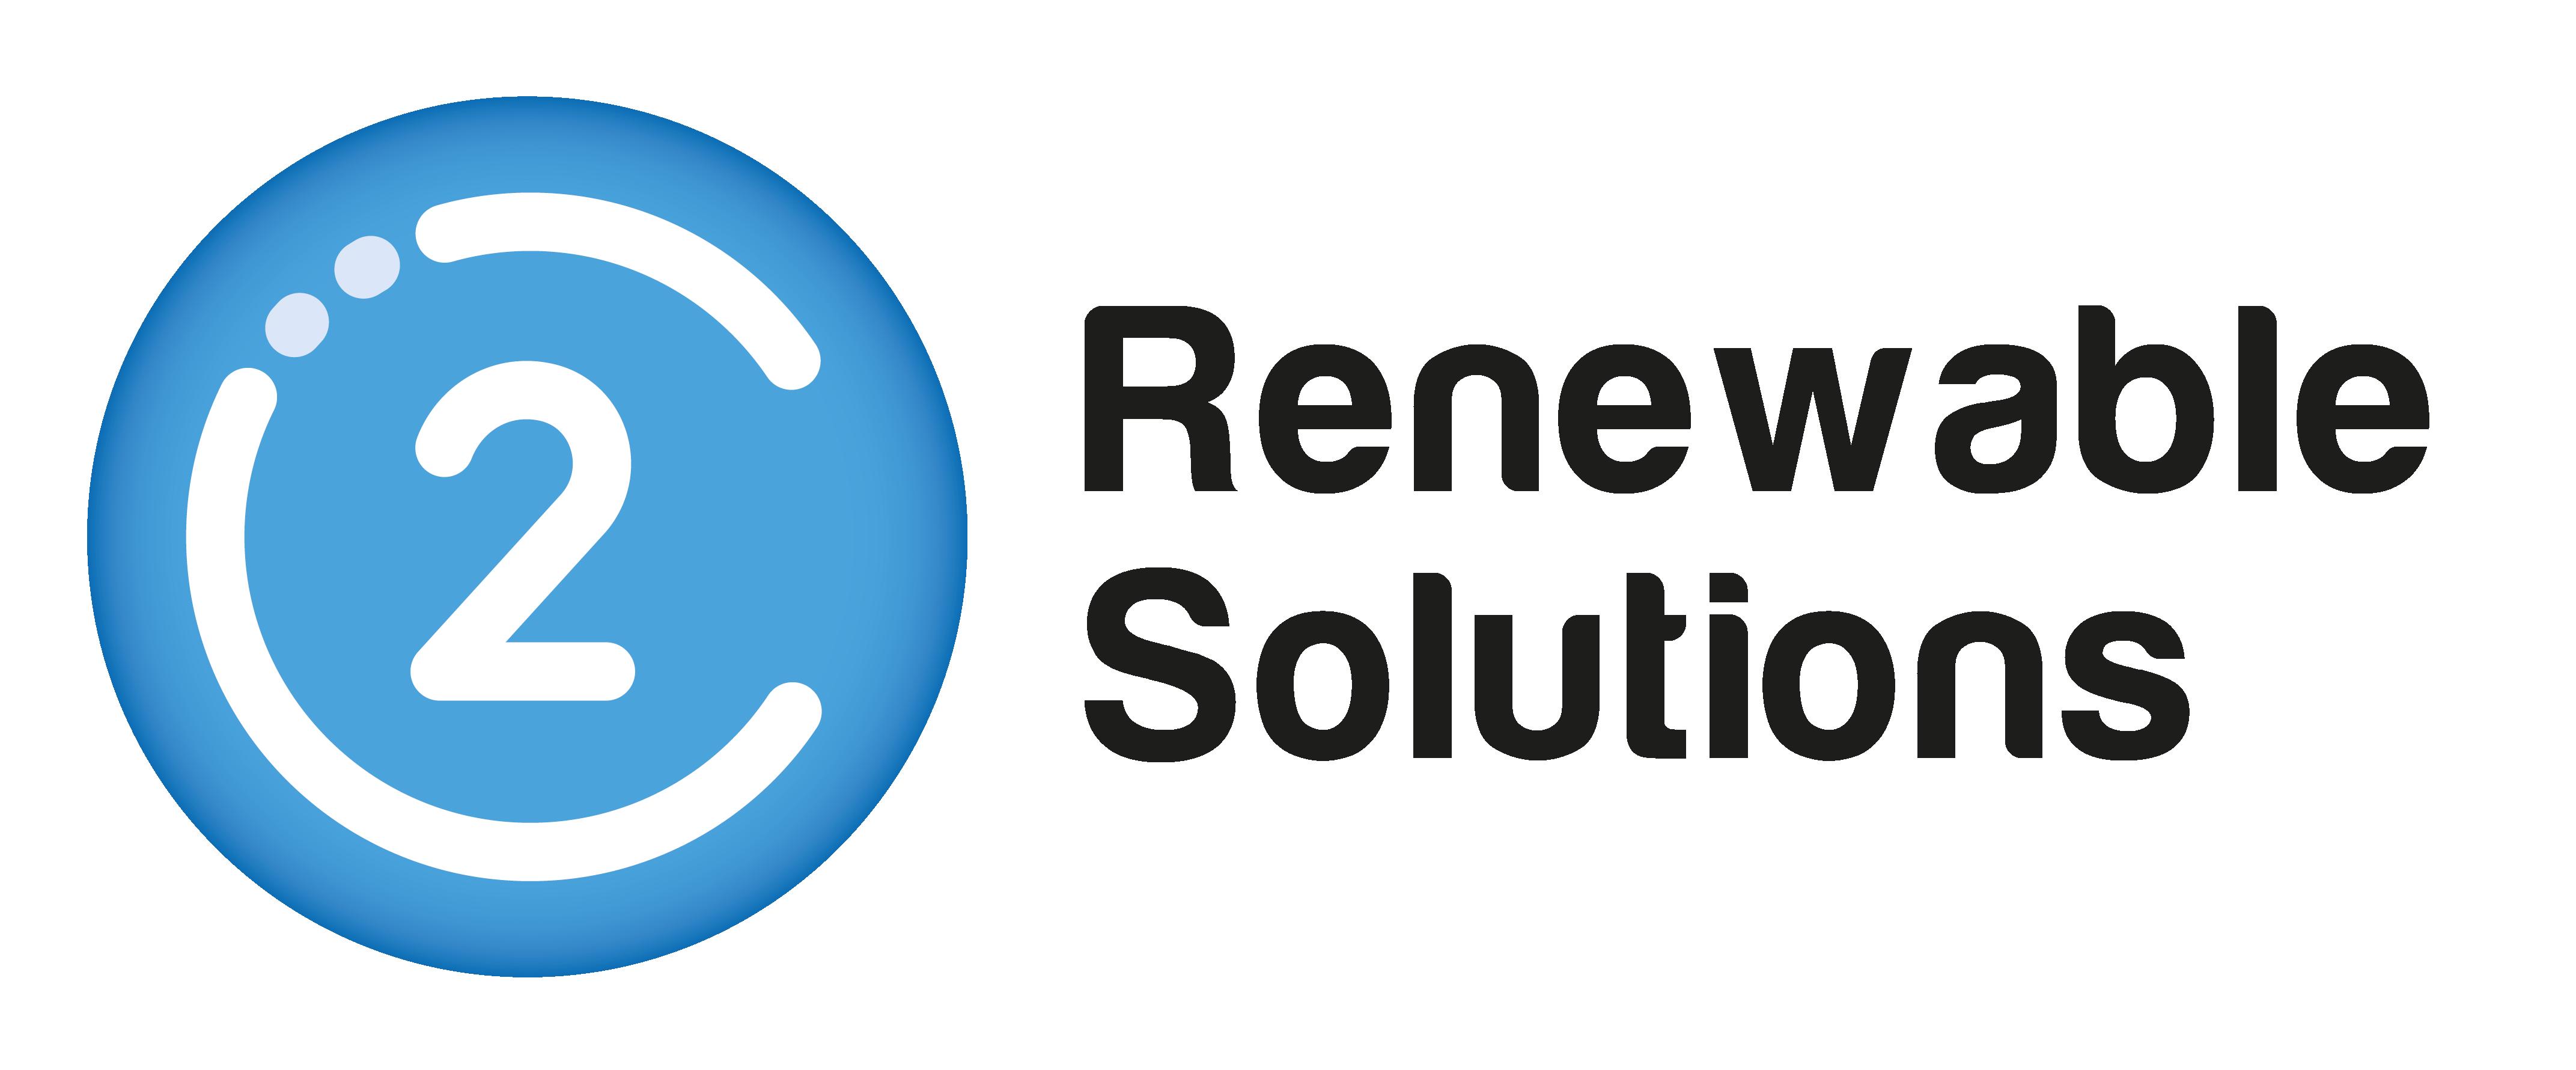 C2 Renewable Solutions